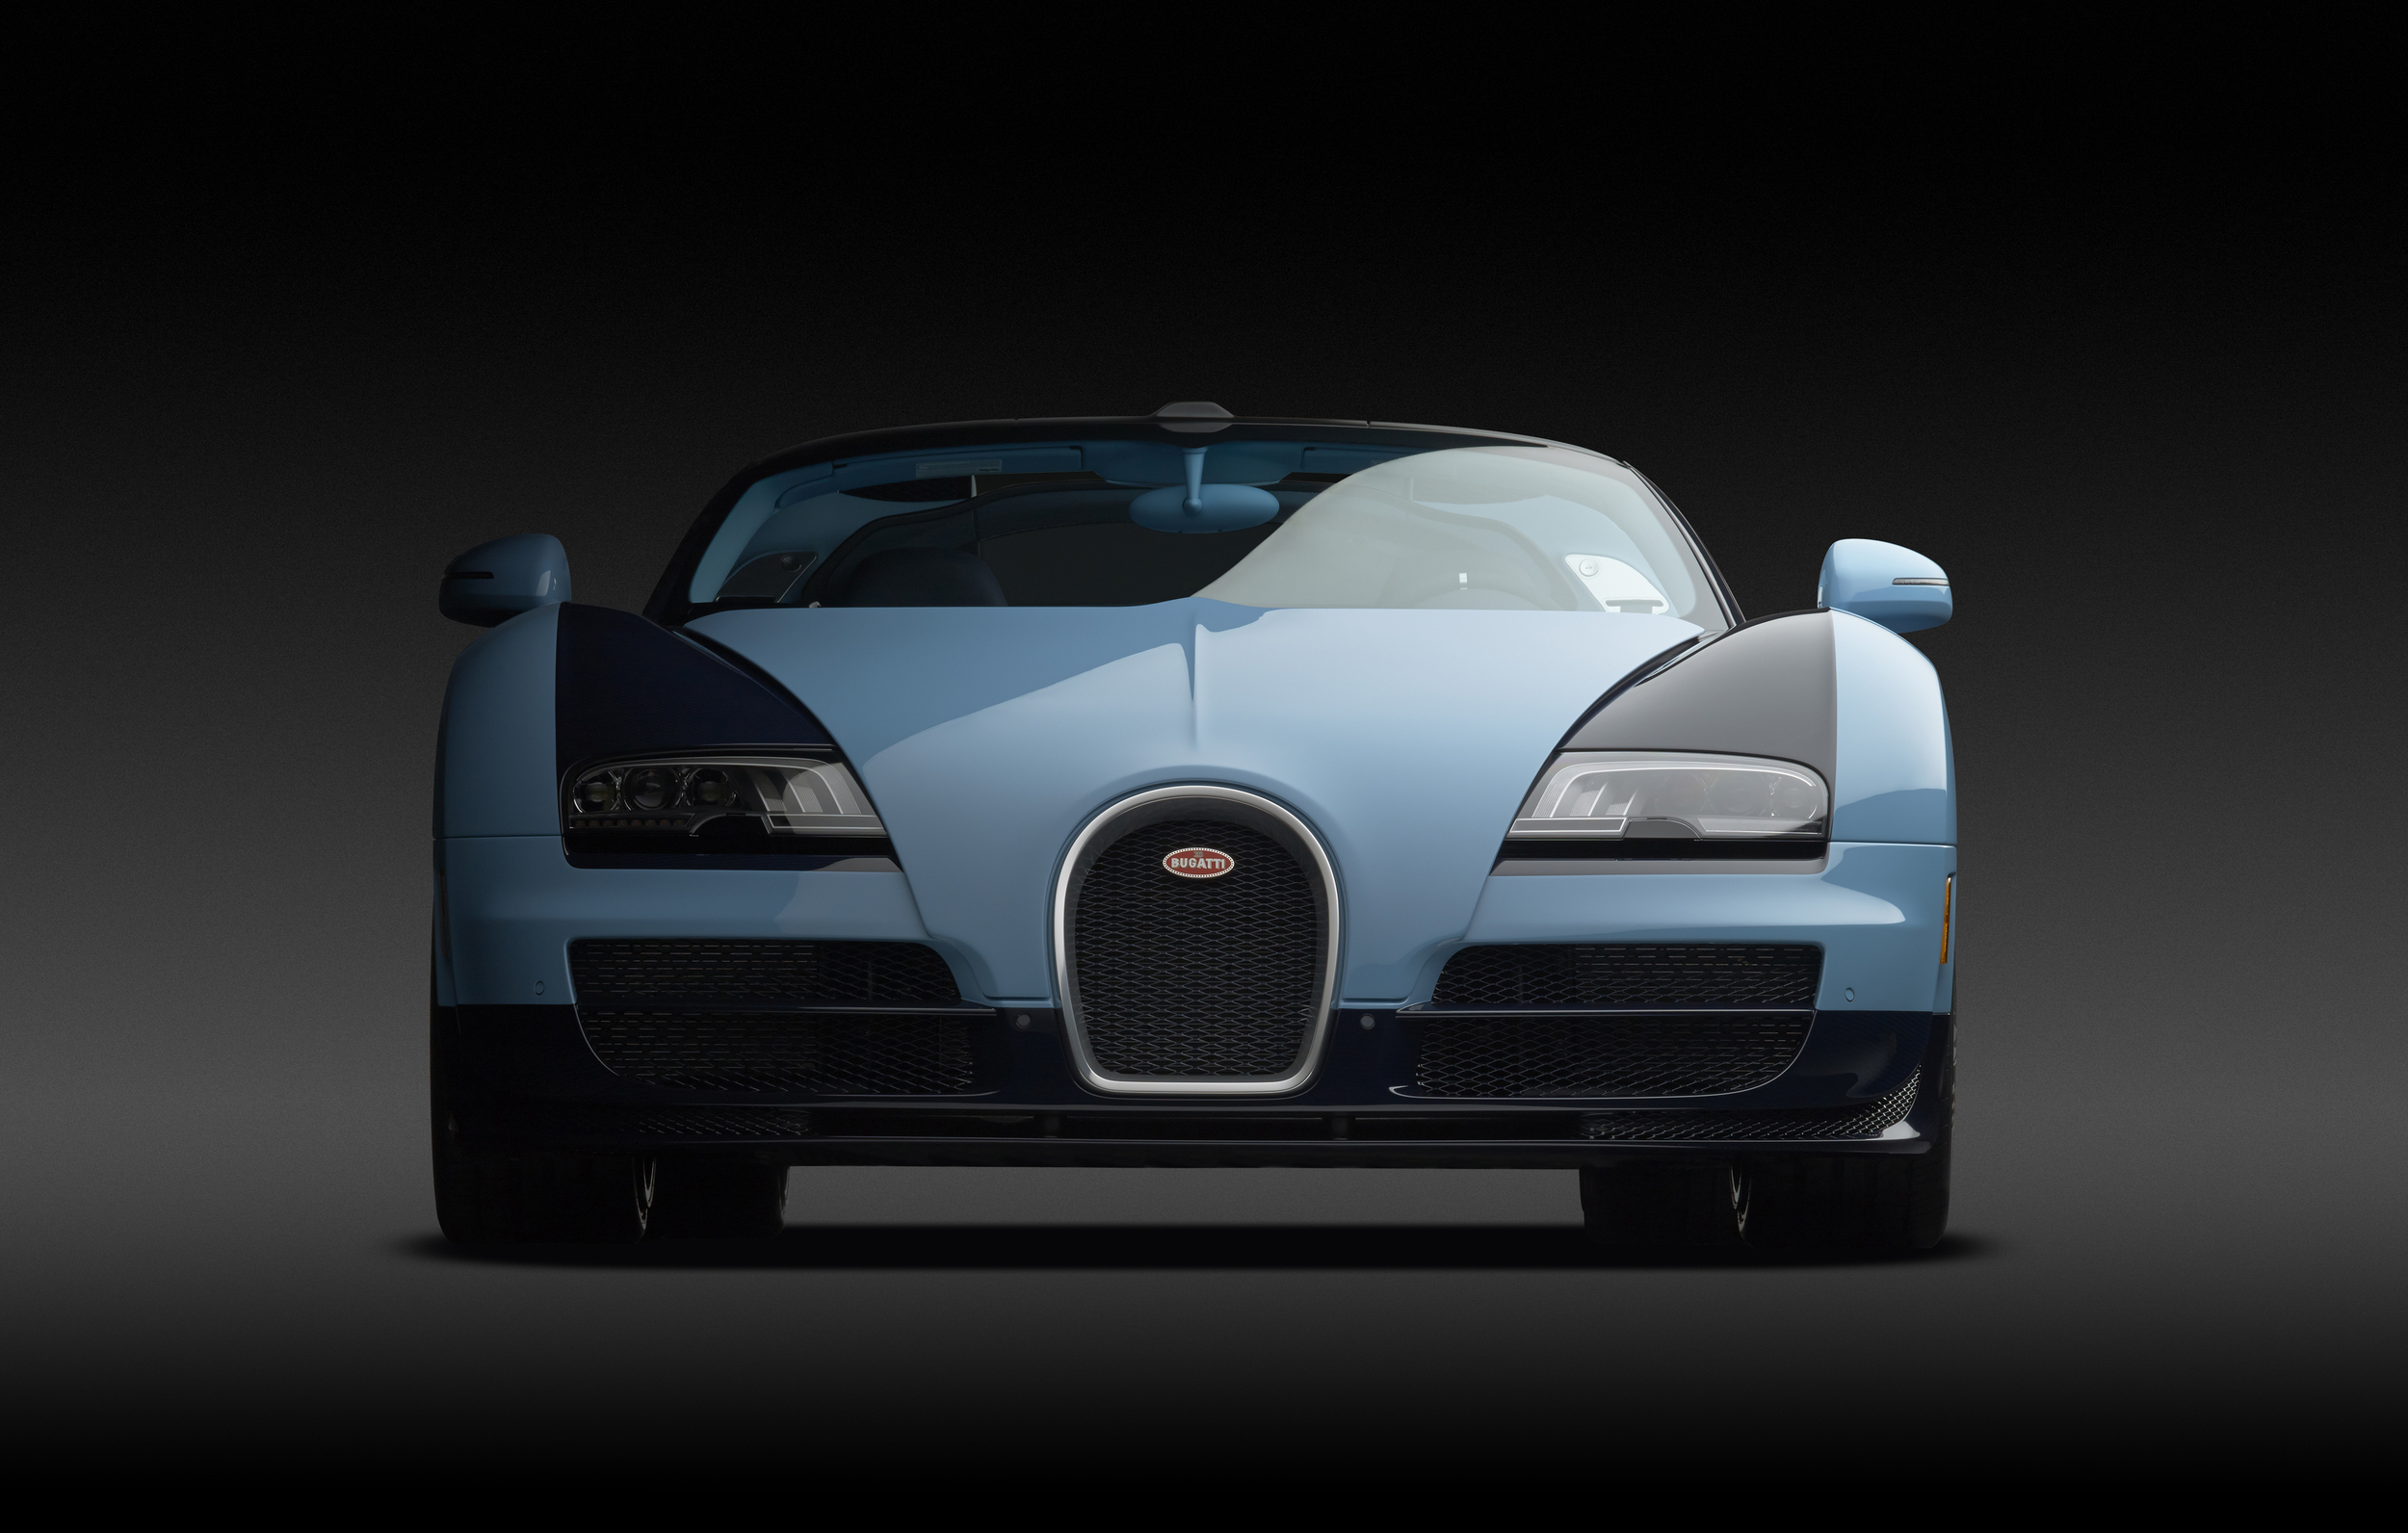 002_Bugatti_Vitesse_Legend_JP Wimille.jpg